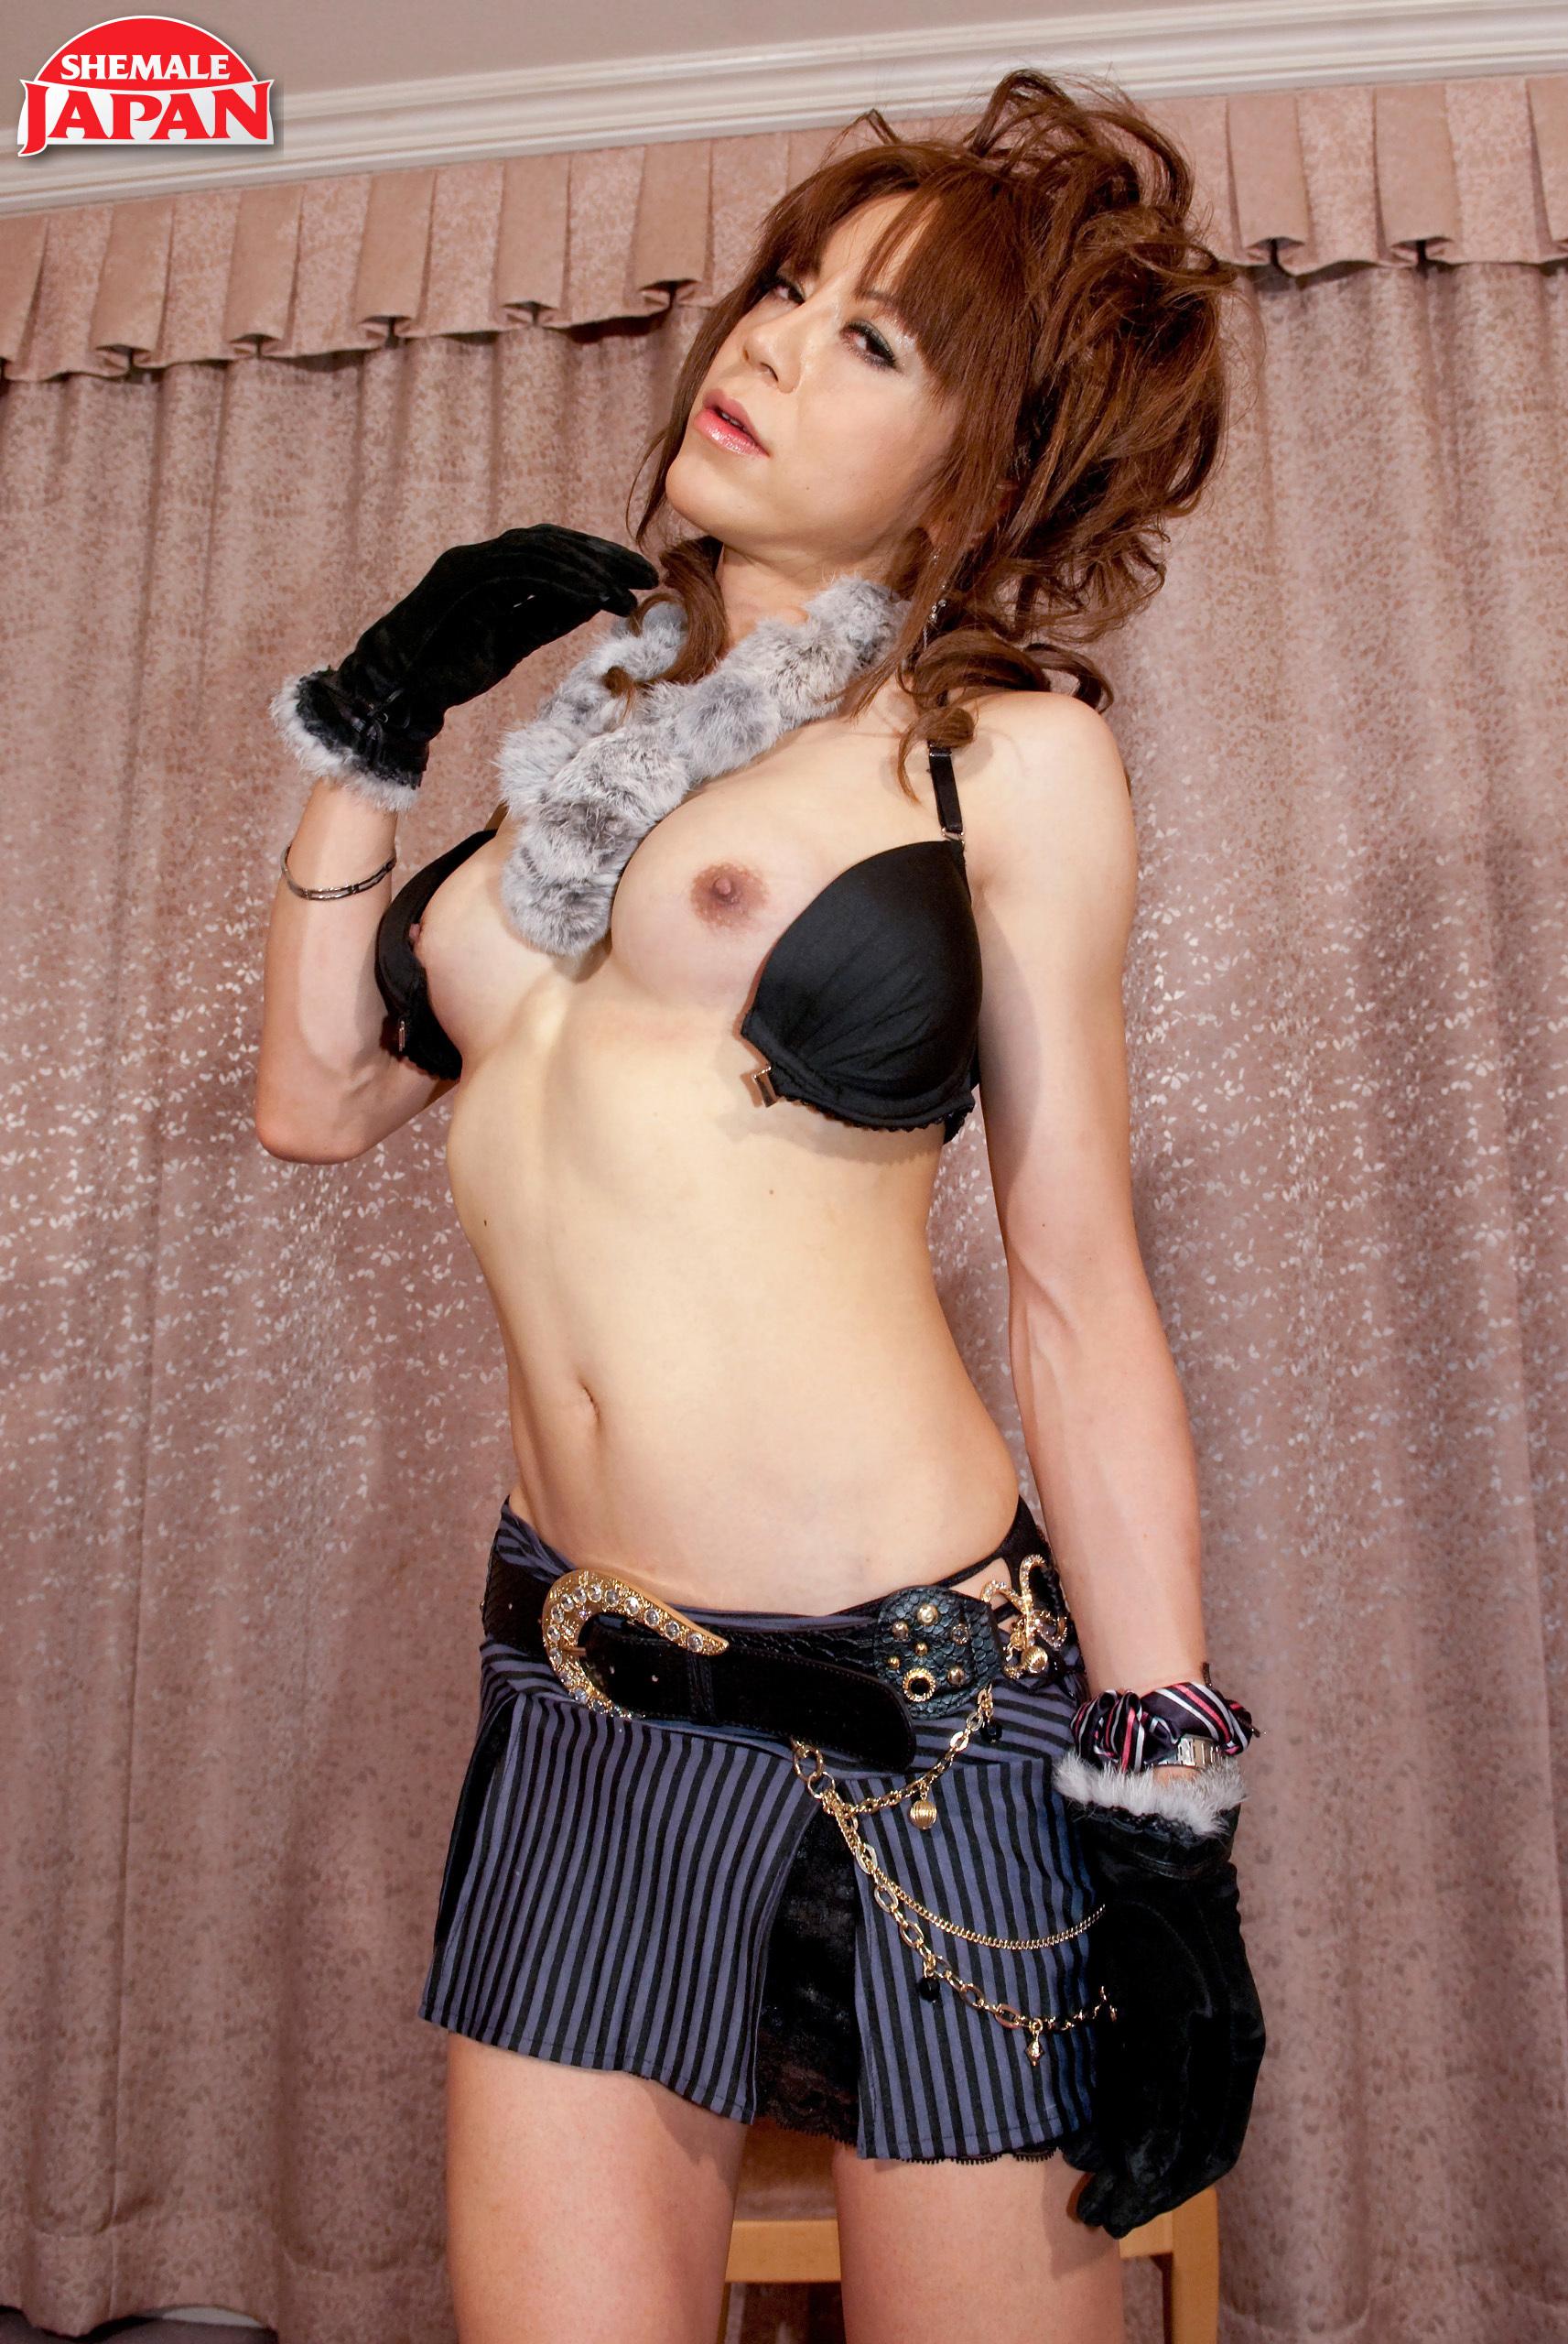 Inviting Seira Mikami!